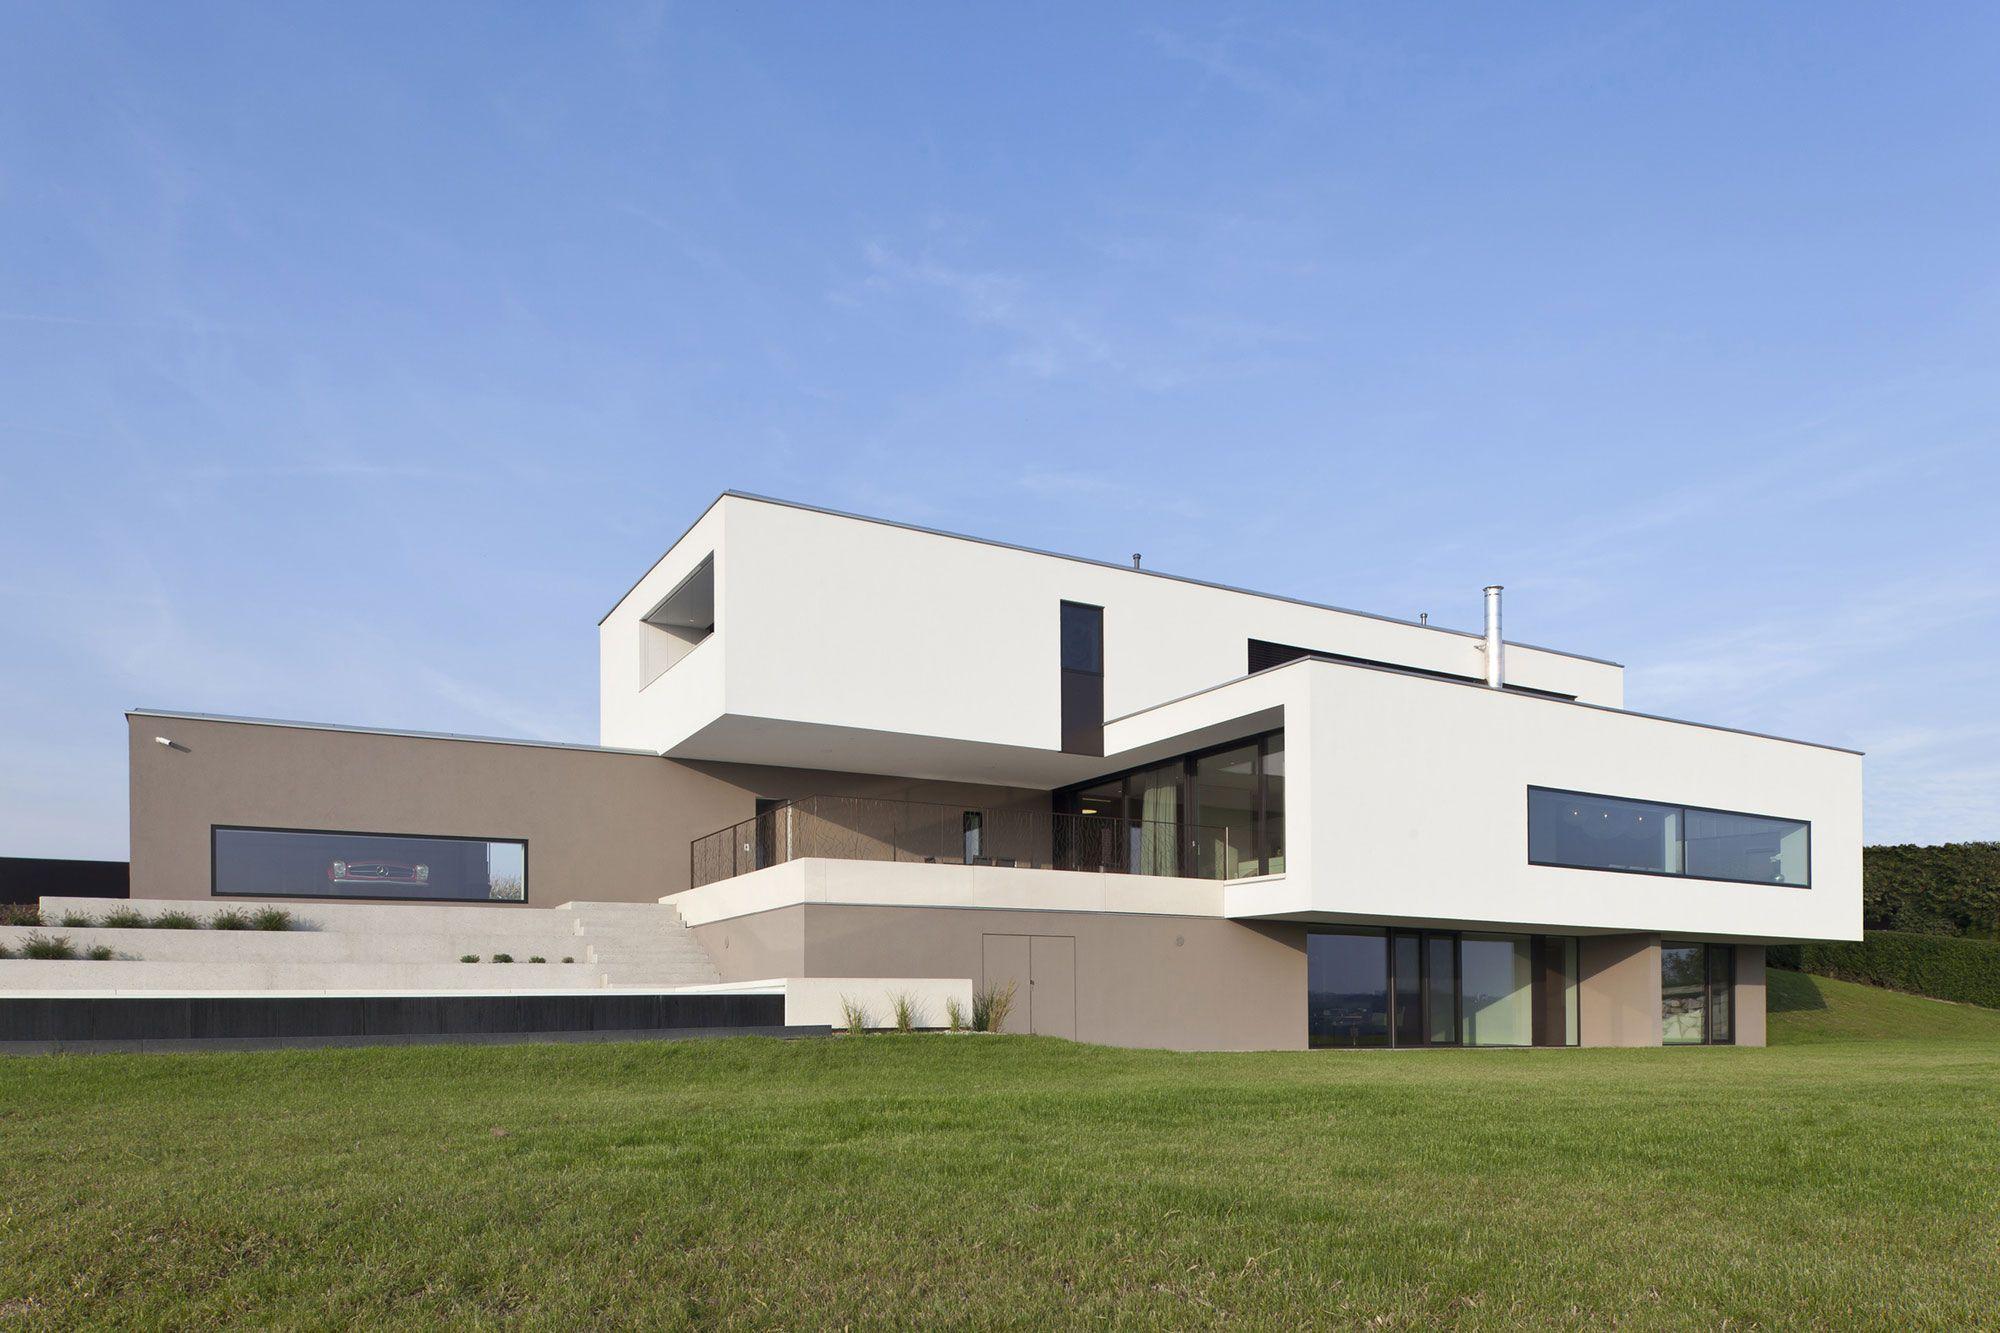 House P by Frohring Ablinger Architekten (1) | Architecture ...